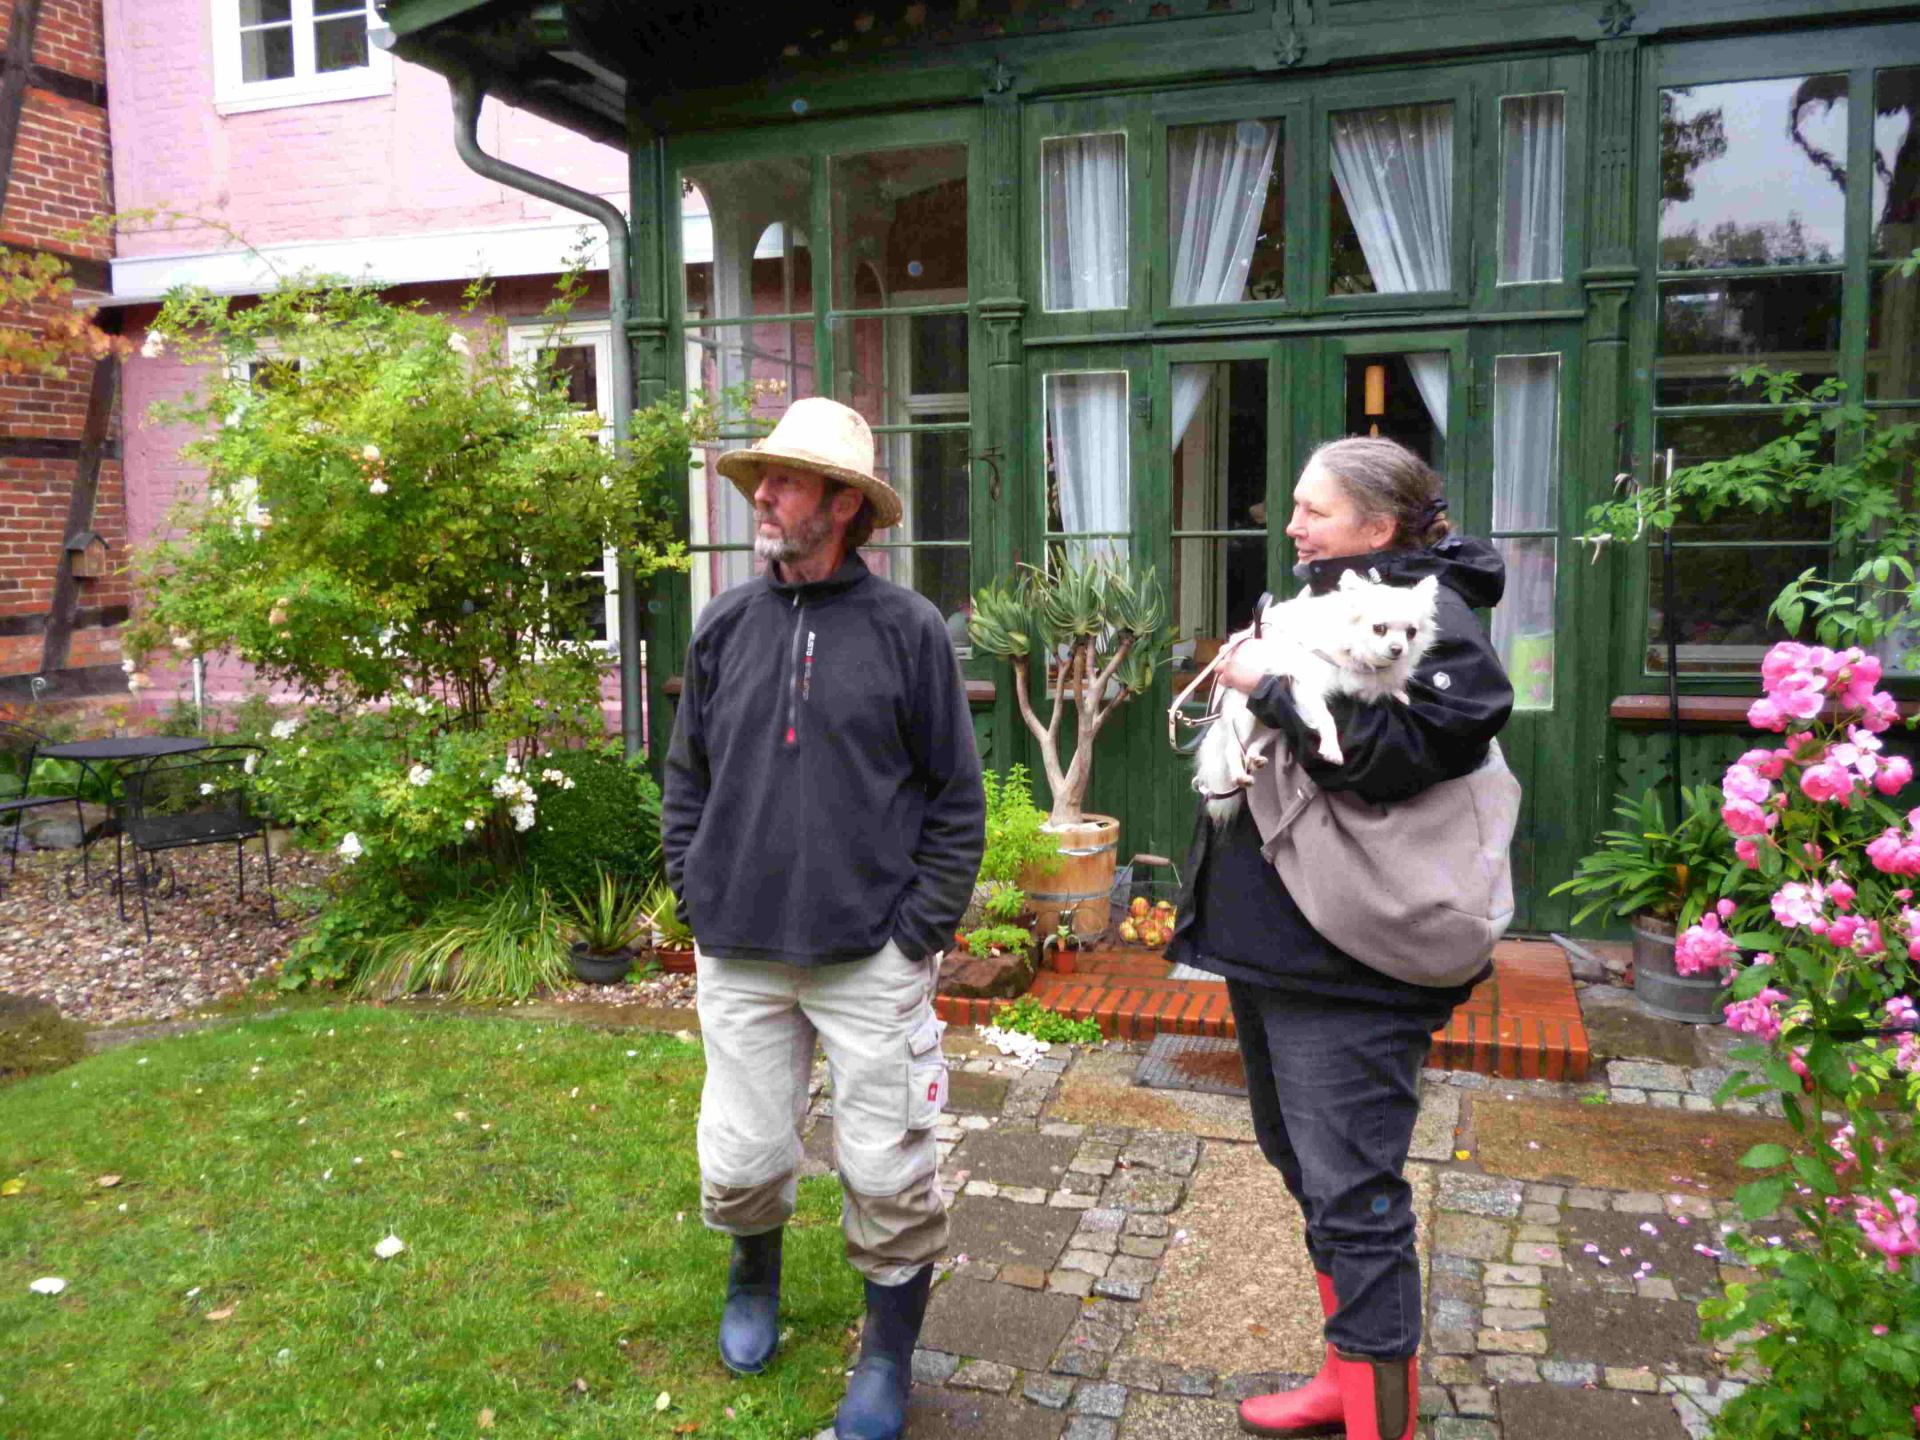 Offene Gartenpfporte 26-09-2020 Bild 02